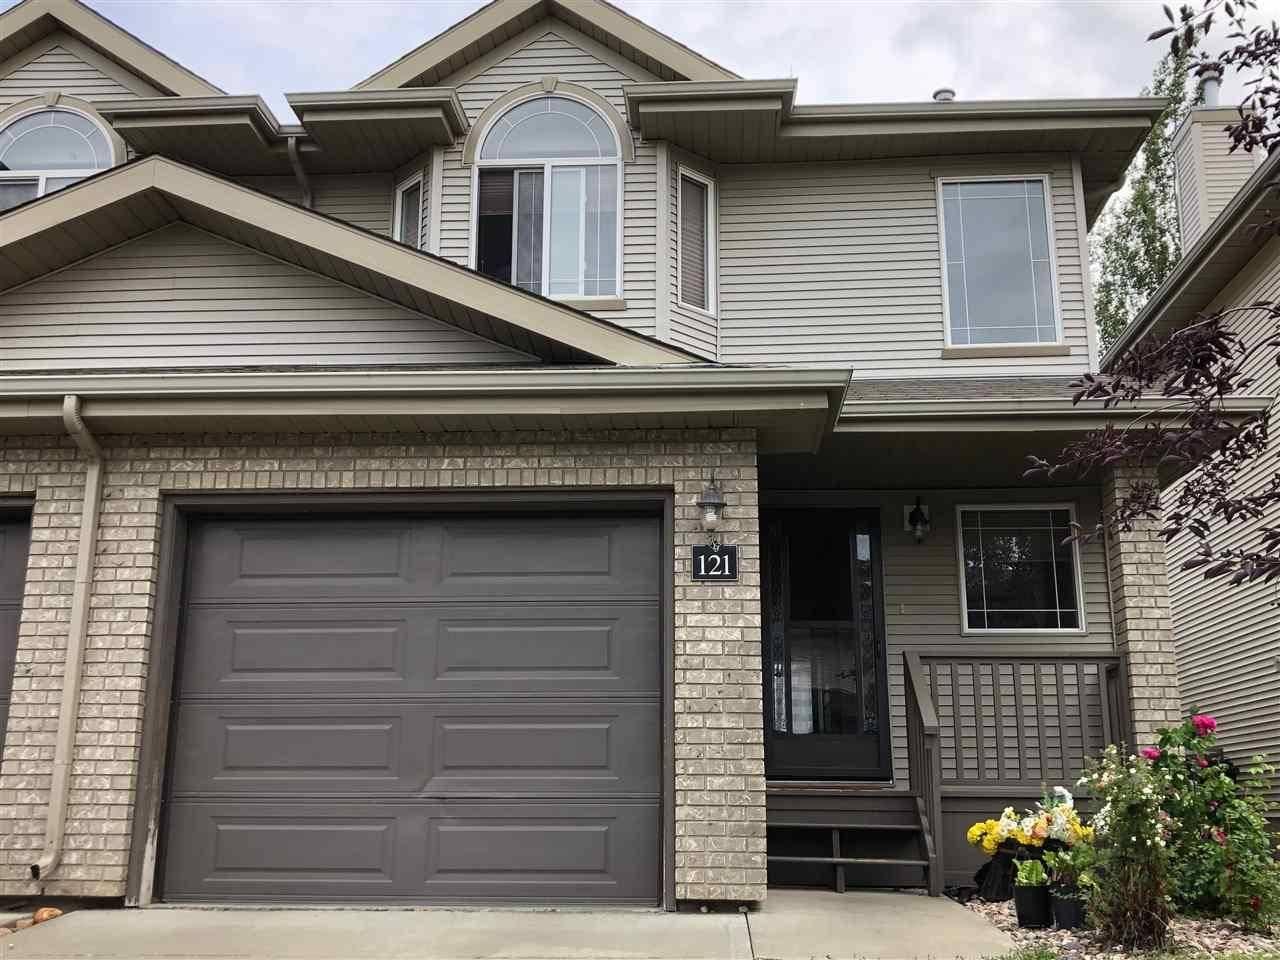 Townhouse for sale at 155 Crocus Cres Unit 121 Sherwood Park Alberta - MLS: E4182021